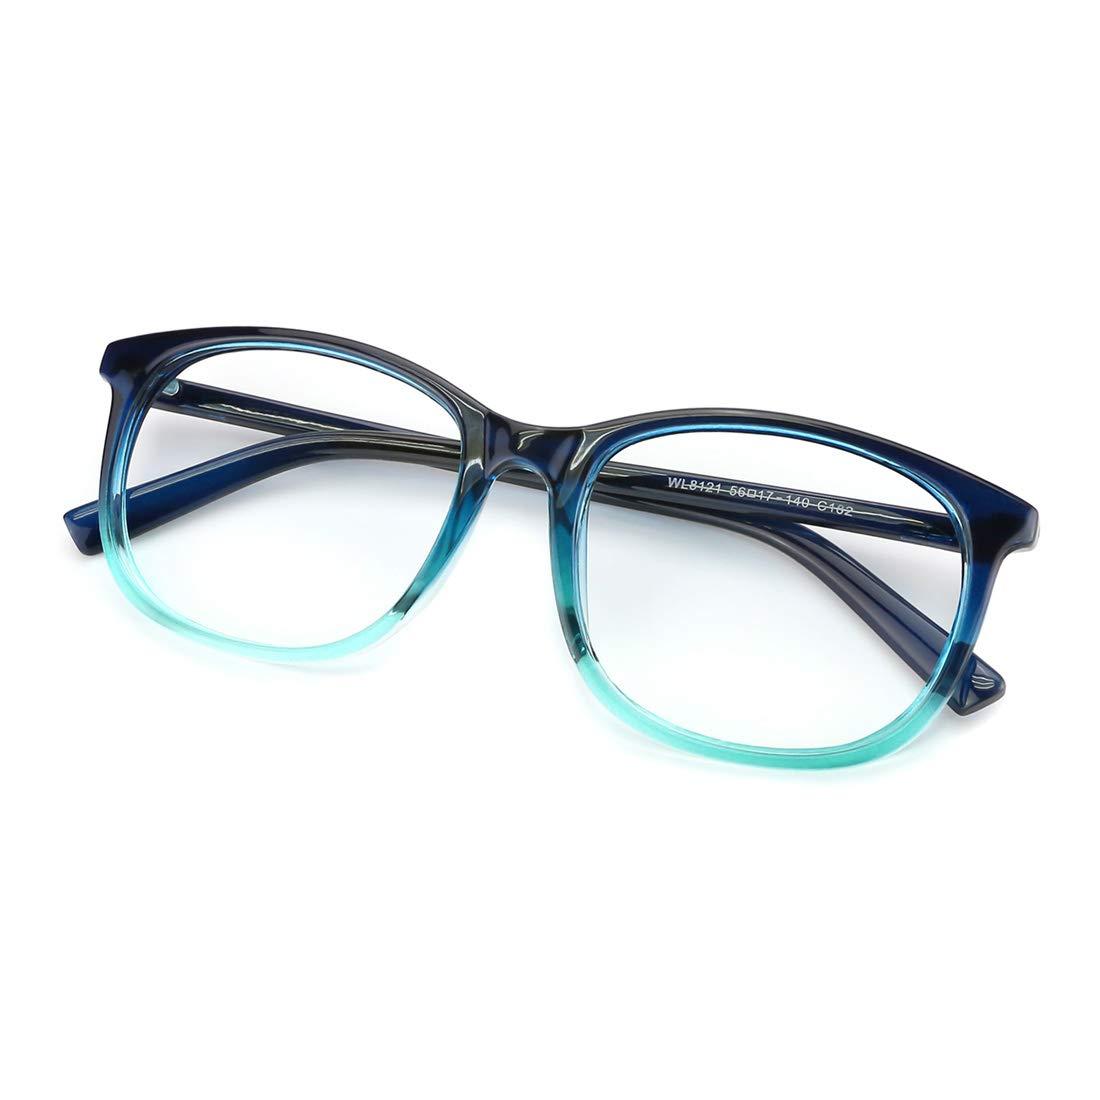 Slocyclub Unisex Blue Light Blocking Glasses Oversized Non-prescription Glasses Round Clear Lens Eyeglasses 00095101